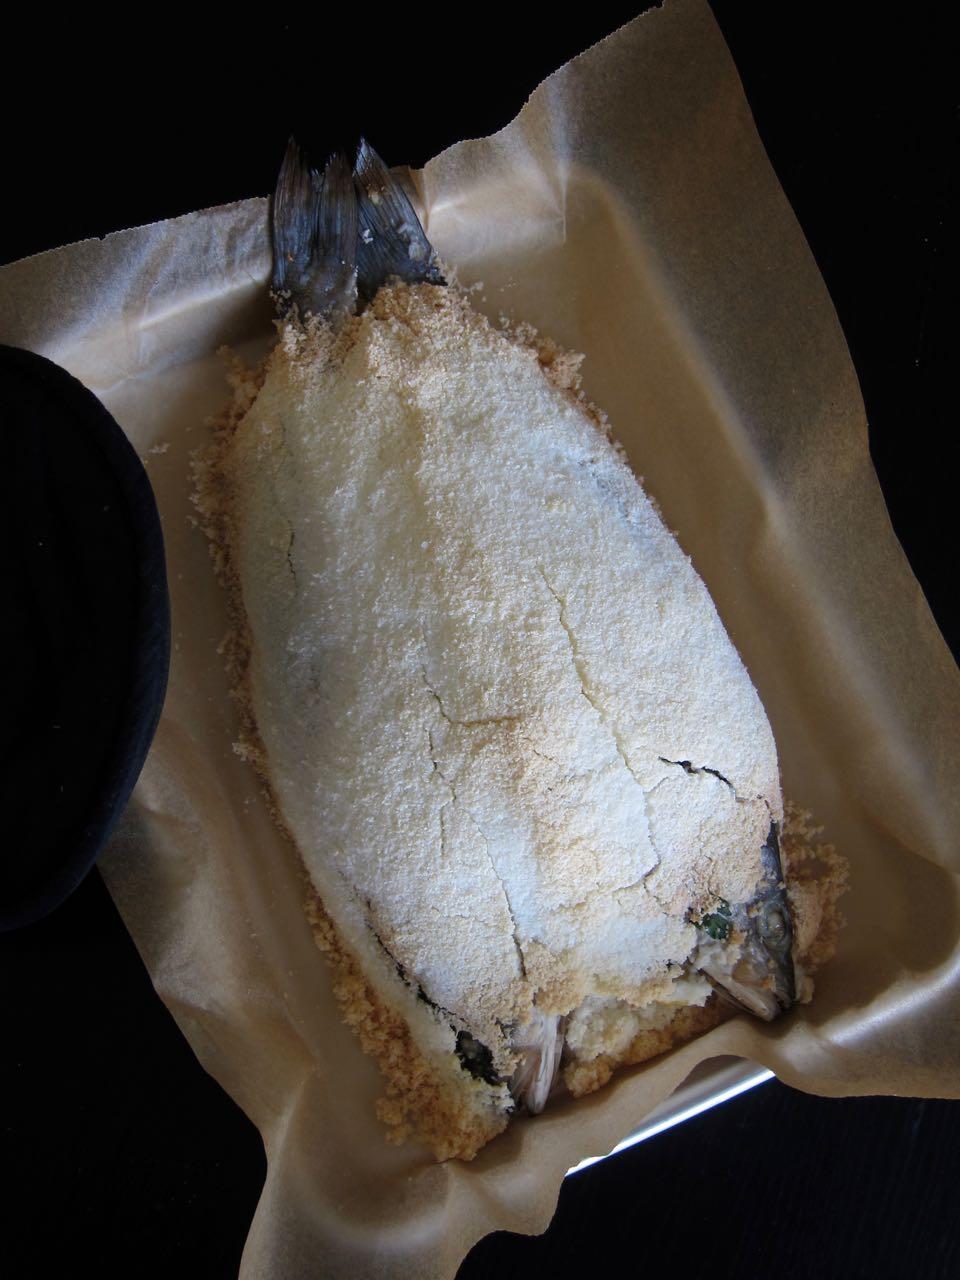 Salt Baked Whole Fish